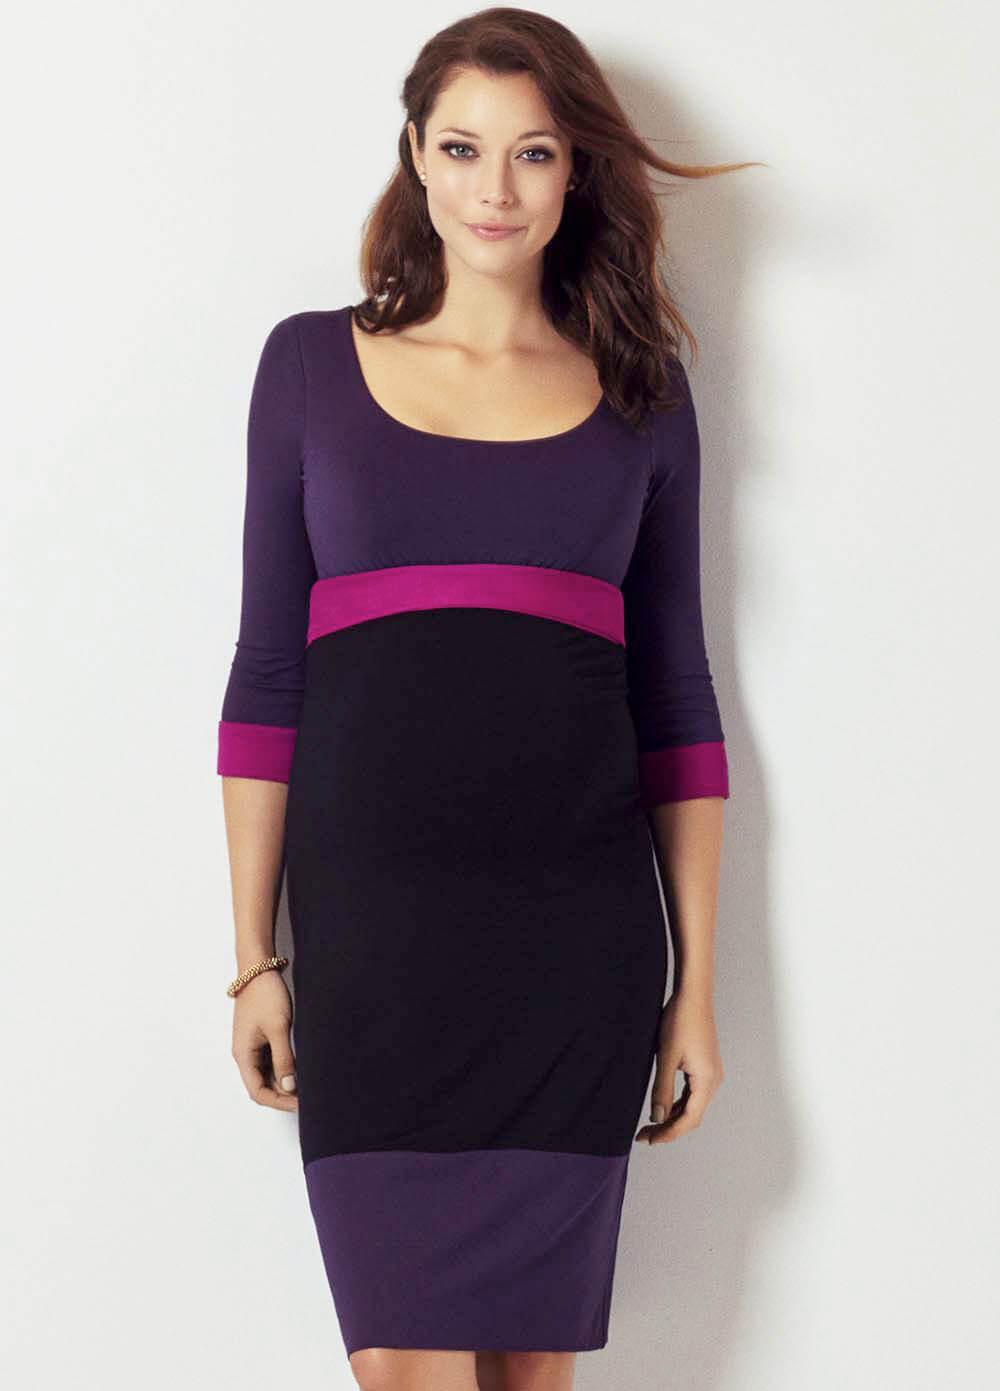 Purpleblack colour block maternity dress by tiffany rose ombrellifo Images